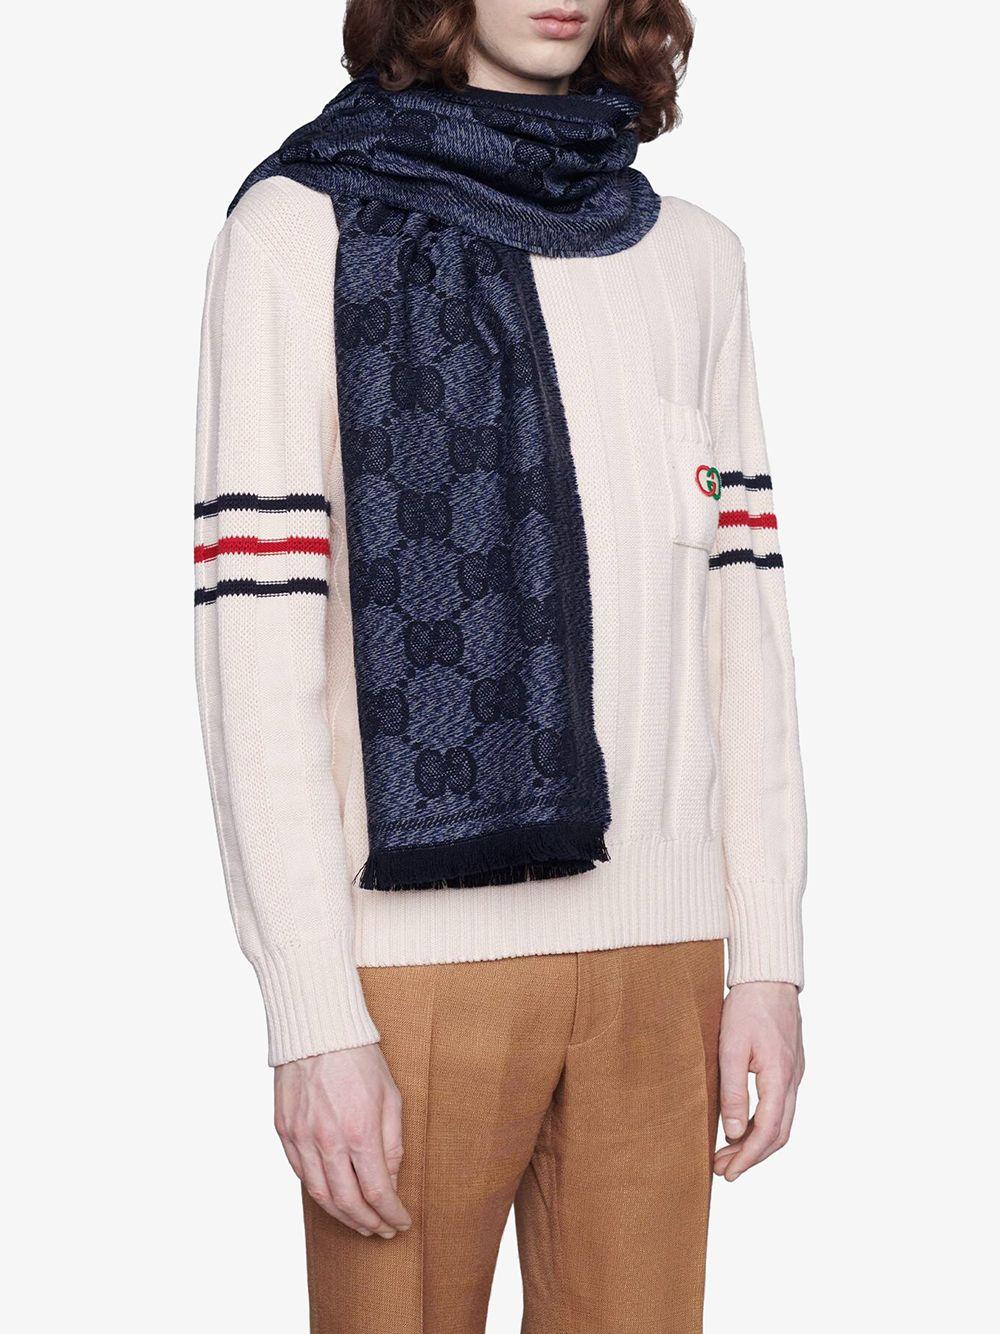 blue 100% wool Gucci Supreme pattern jacquard scarf  GUCCI      625898-4G0594068